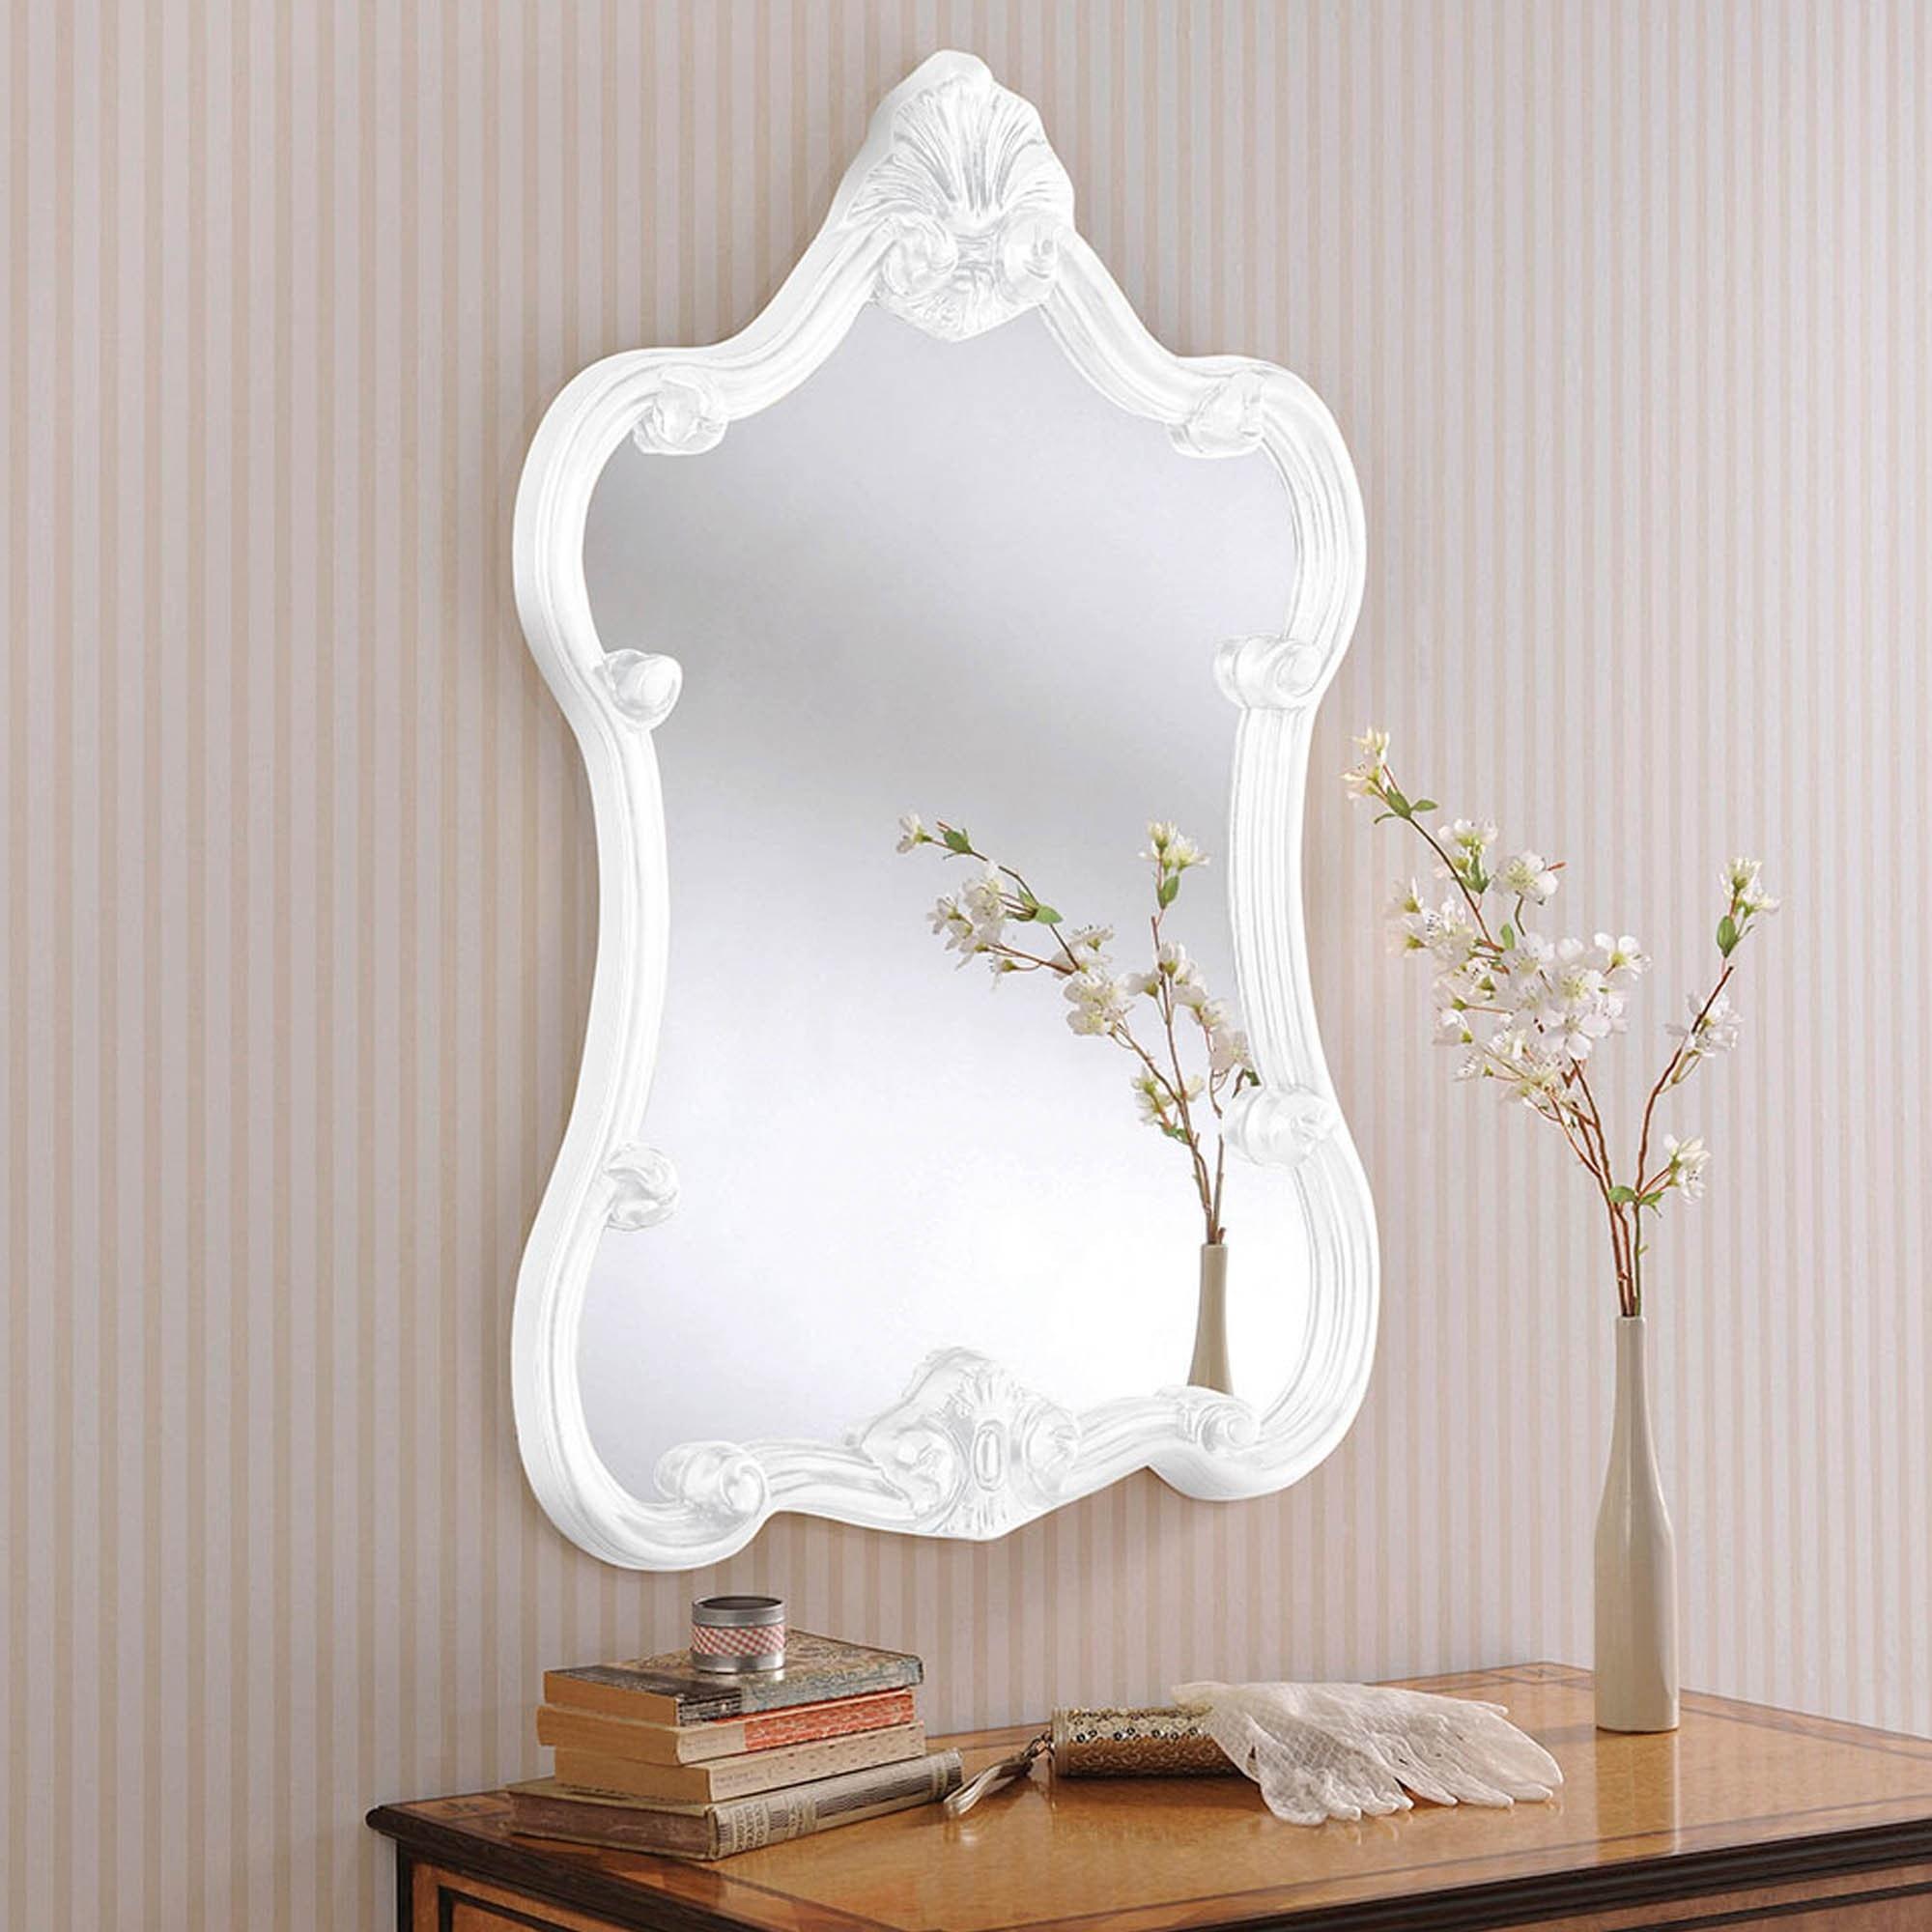 Decorative White Ornate Wall Mirror Wall Mirrors